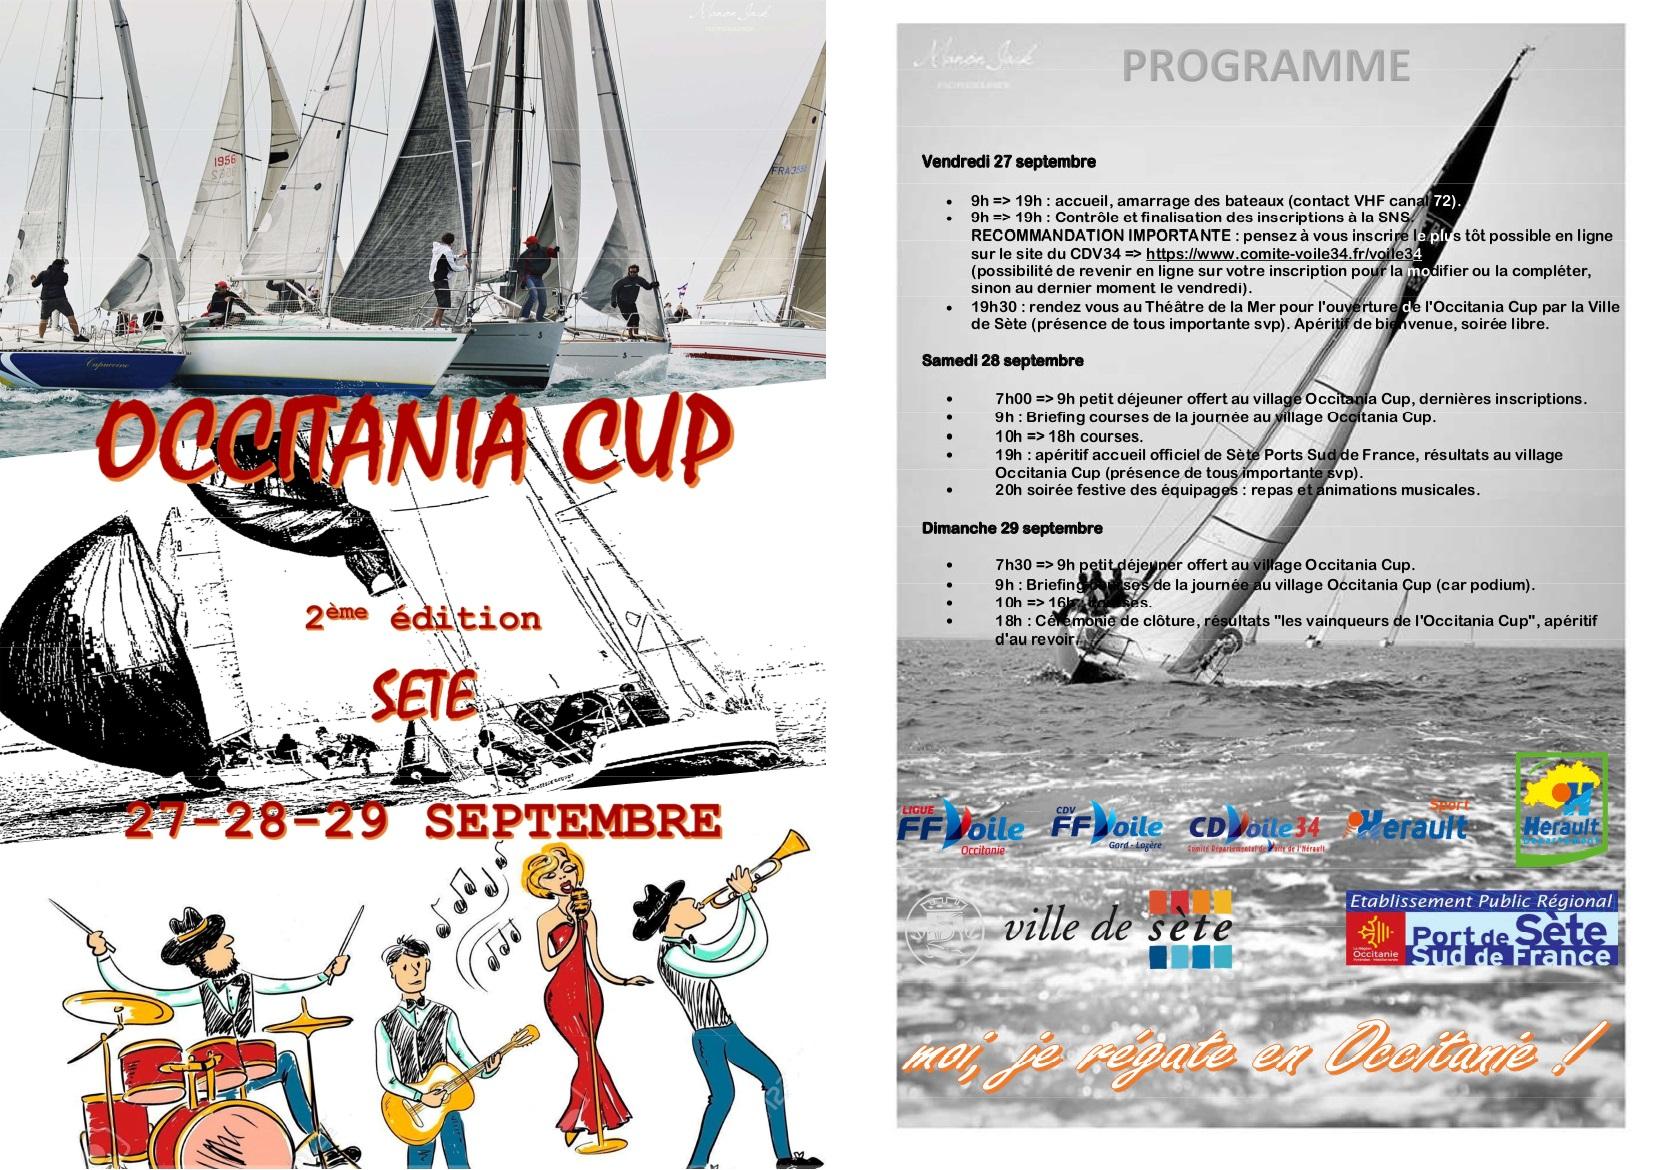 https://www.comite-voile34.fr/voile34/images/OCCITANIA_CUP/ProgrammeOccitaniaCup_2019_CDV34.jpg